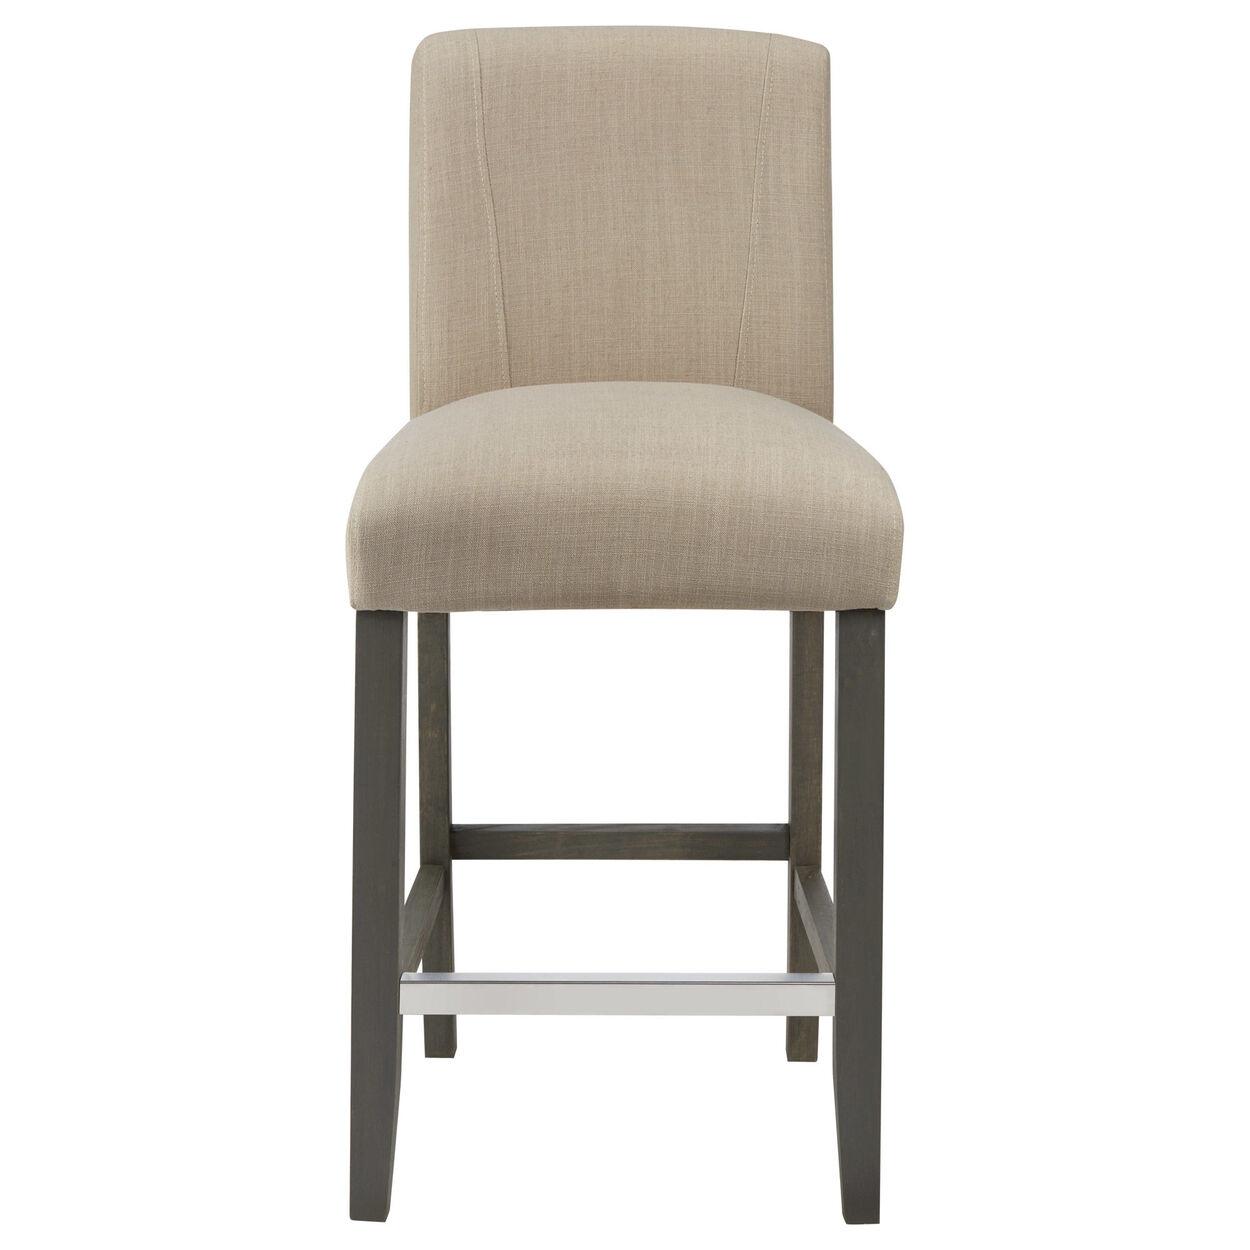 Fabric and rubberwood bar stool